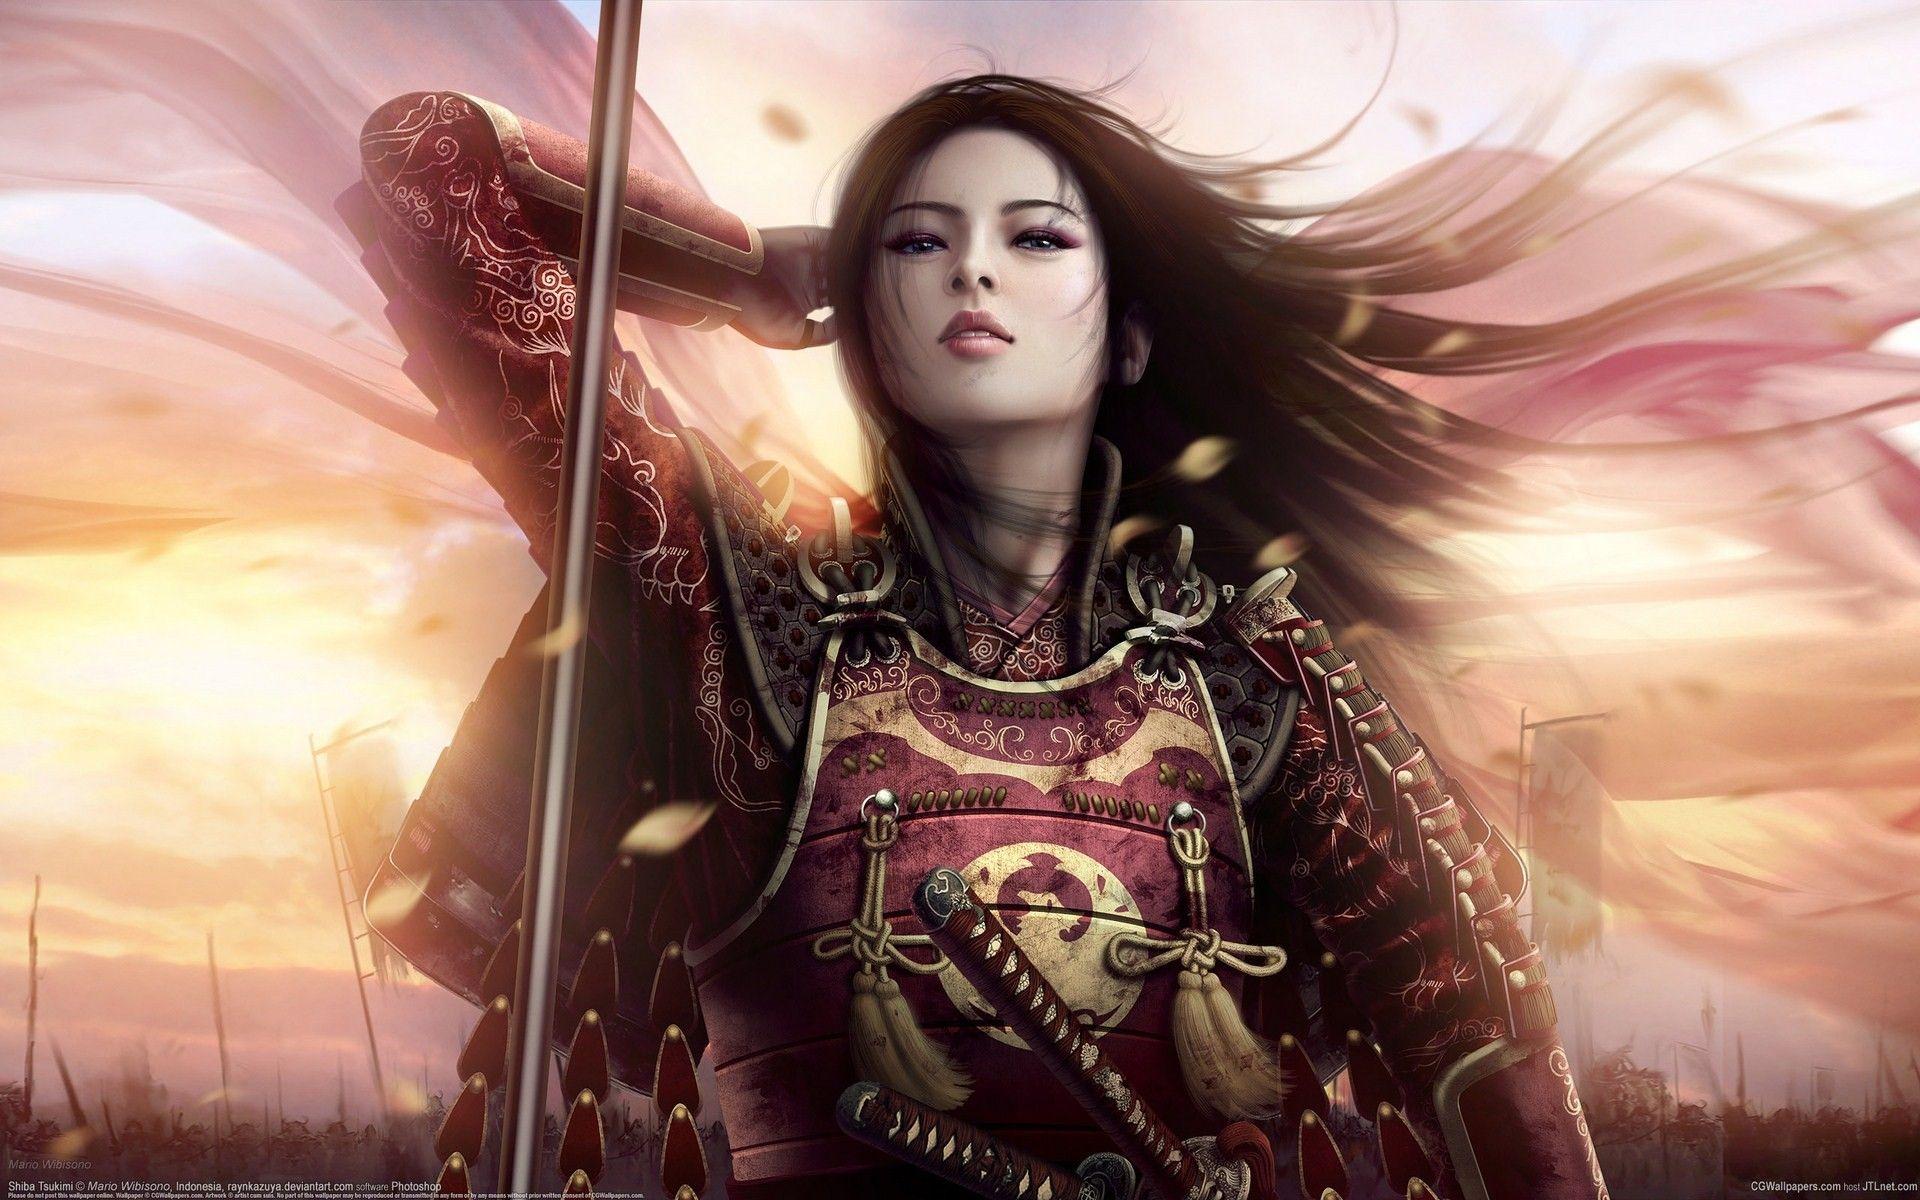 Hd Female Samurai Wallpaper Download Free 104661 Female Samurai Fantasy Women Warrior Woman